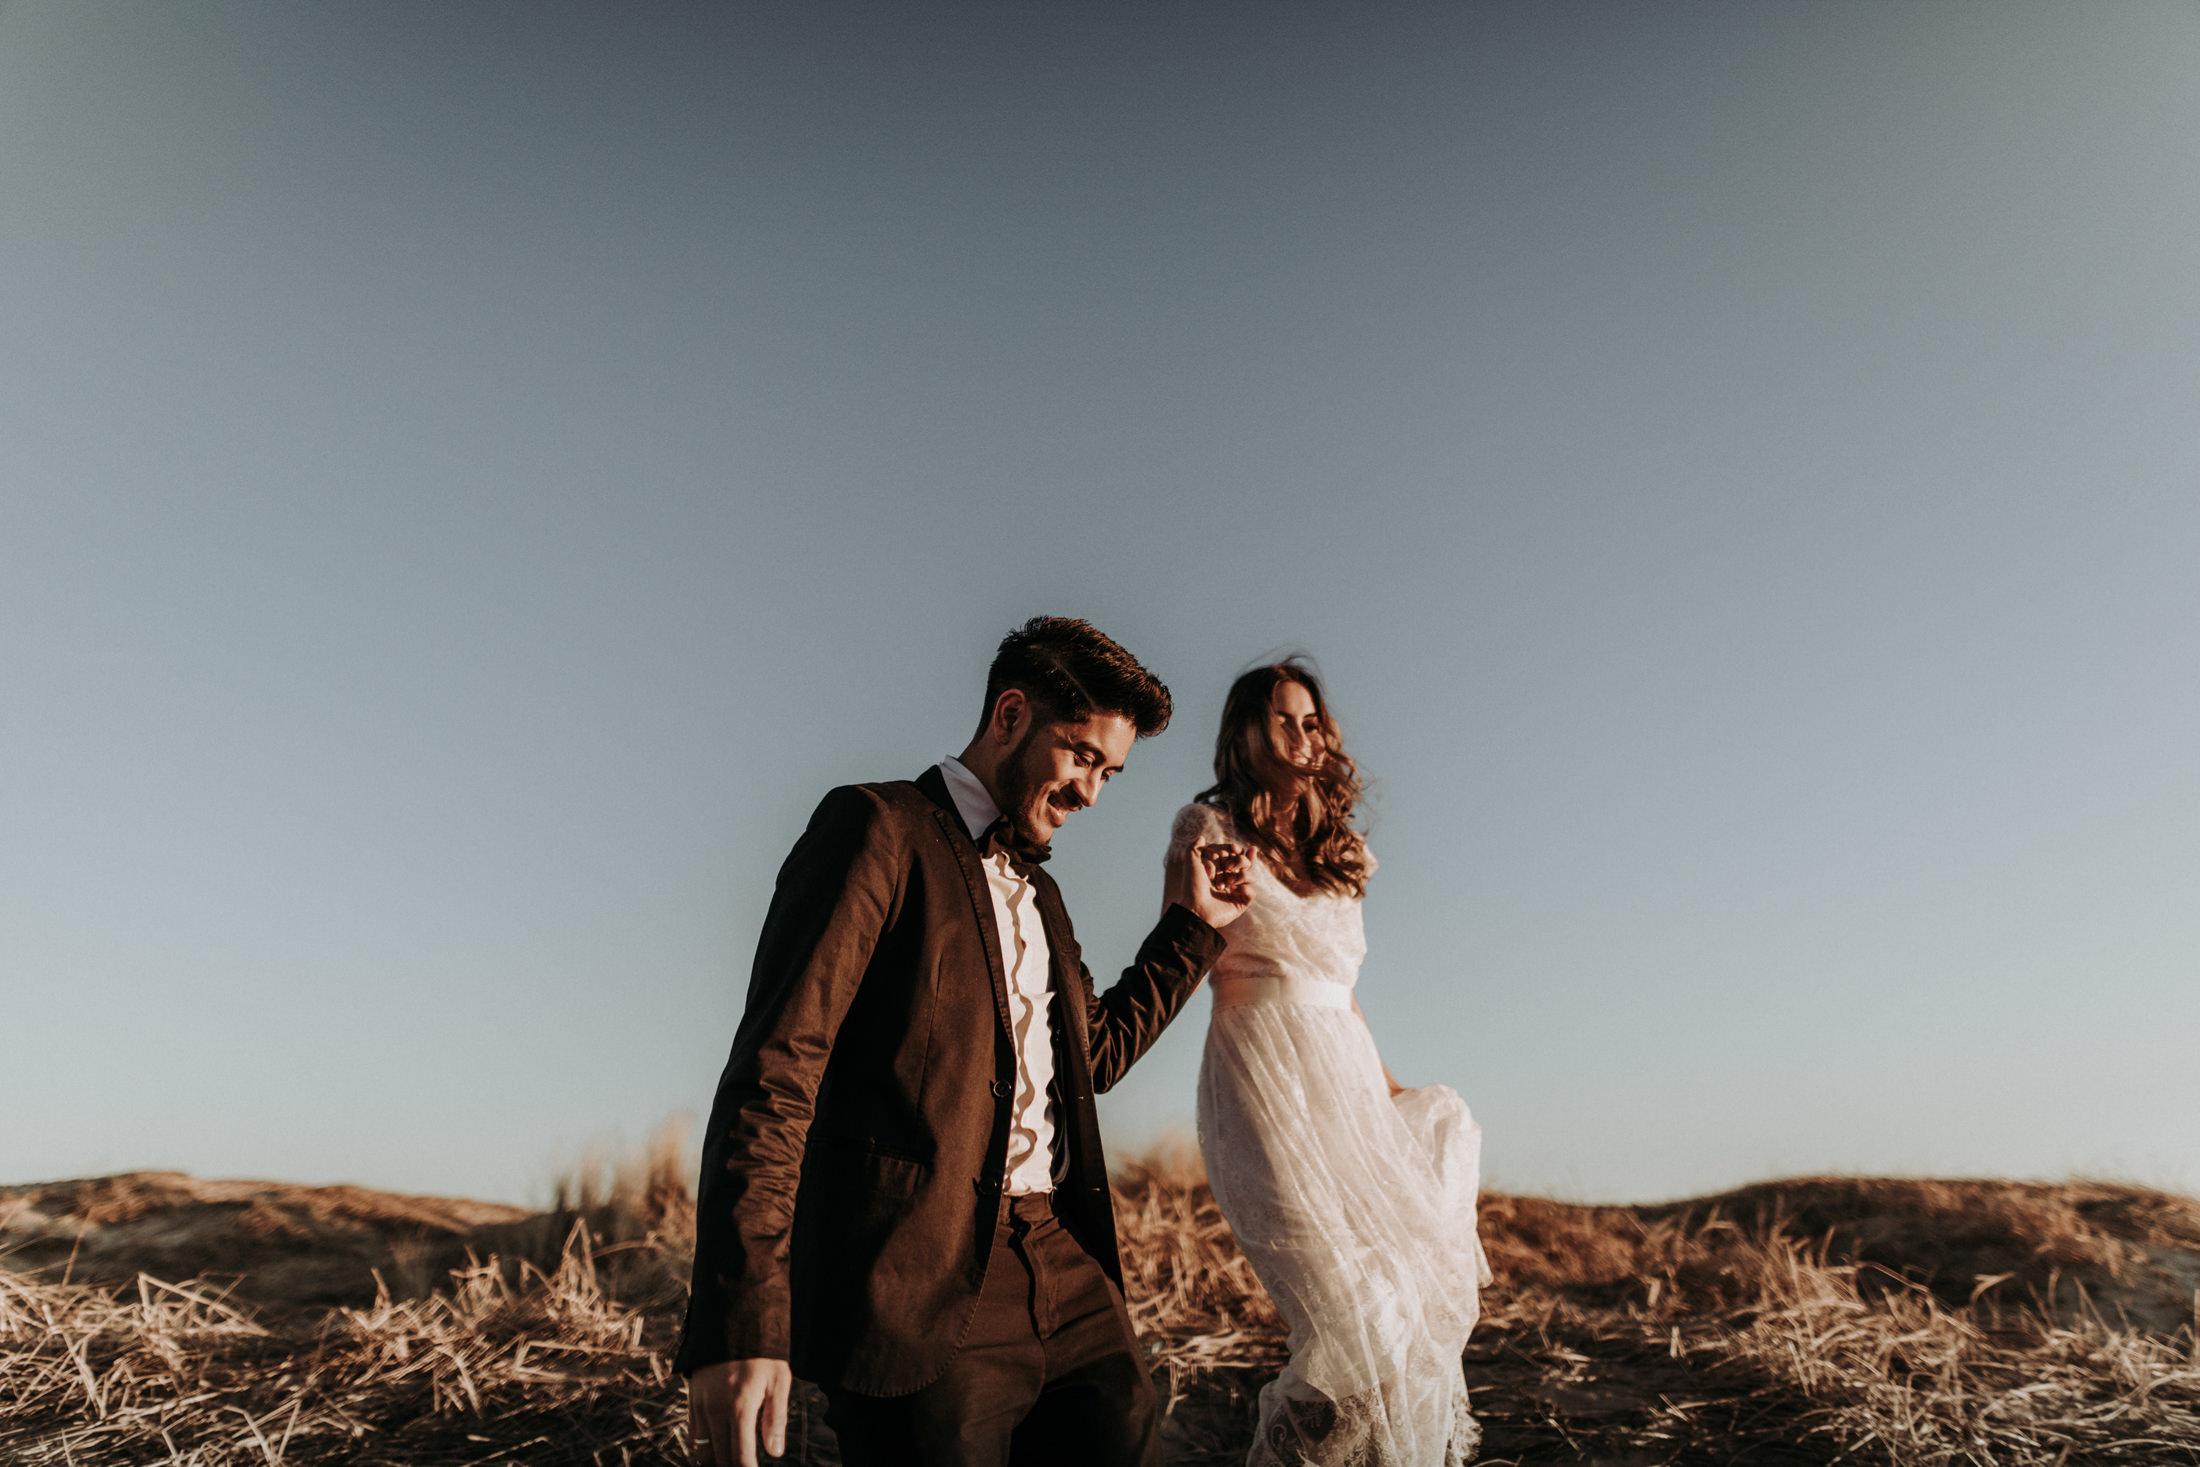 Wedding_Photographer_Mallorca_Daniela-Marquardt_Photography_CanaryIslands_Lanzarote_Iceland_Tuskany_Santorini_Portugal_Schweiz_Austria_Bayern_Elopement_Hochzeitsfotograf_Norddeichich_53